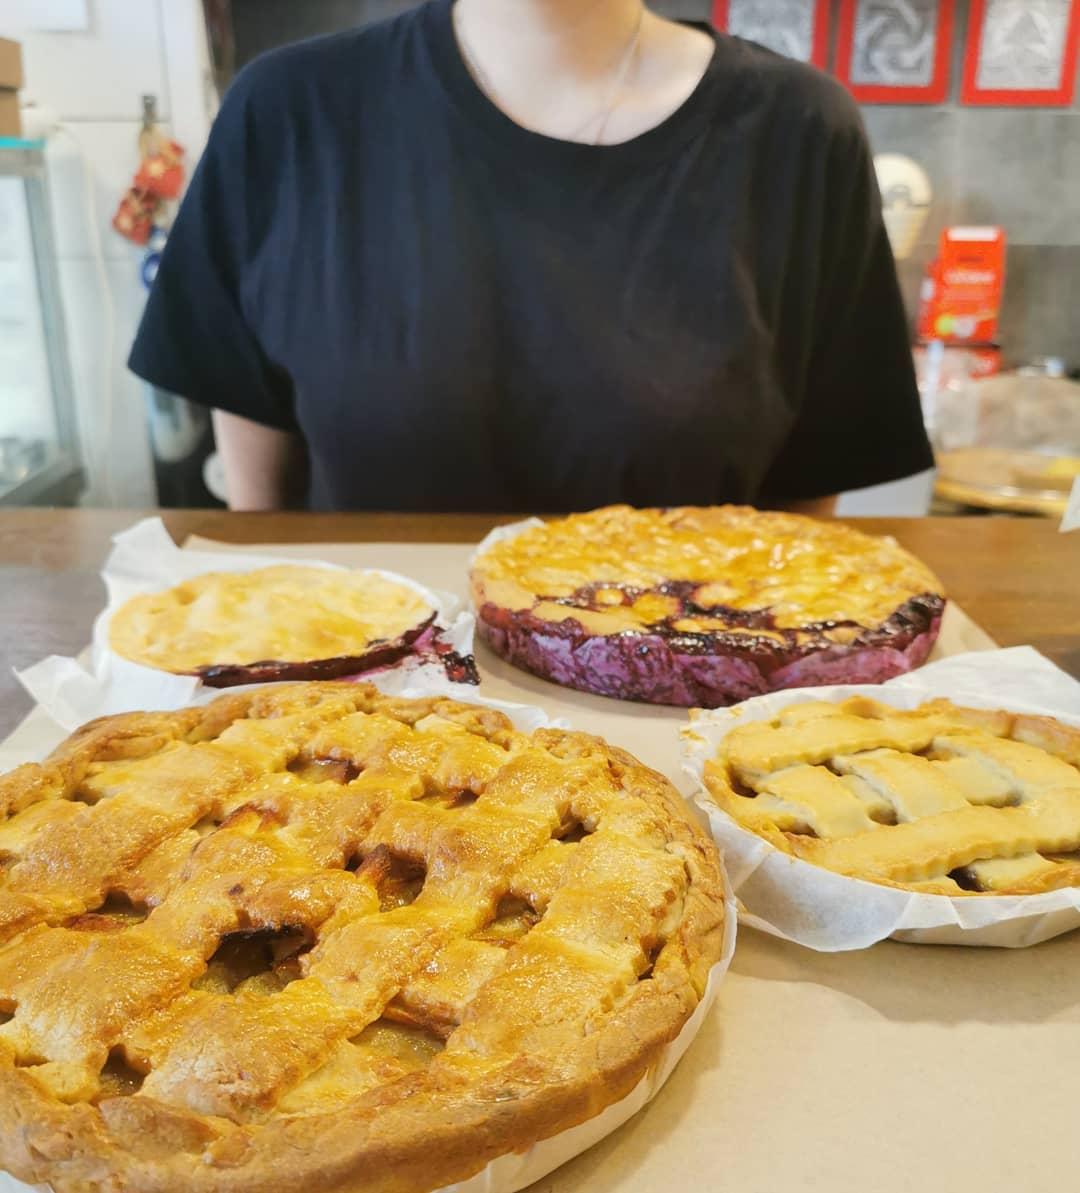 «Pie Shop»: Είσαι έτοιμος να γνωρίσεις τις νοστιμότερες πίτες από όλο τον πλανήτη;